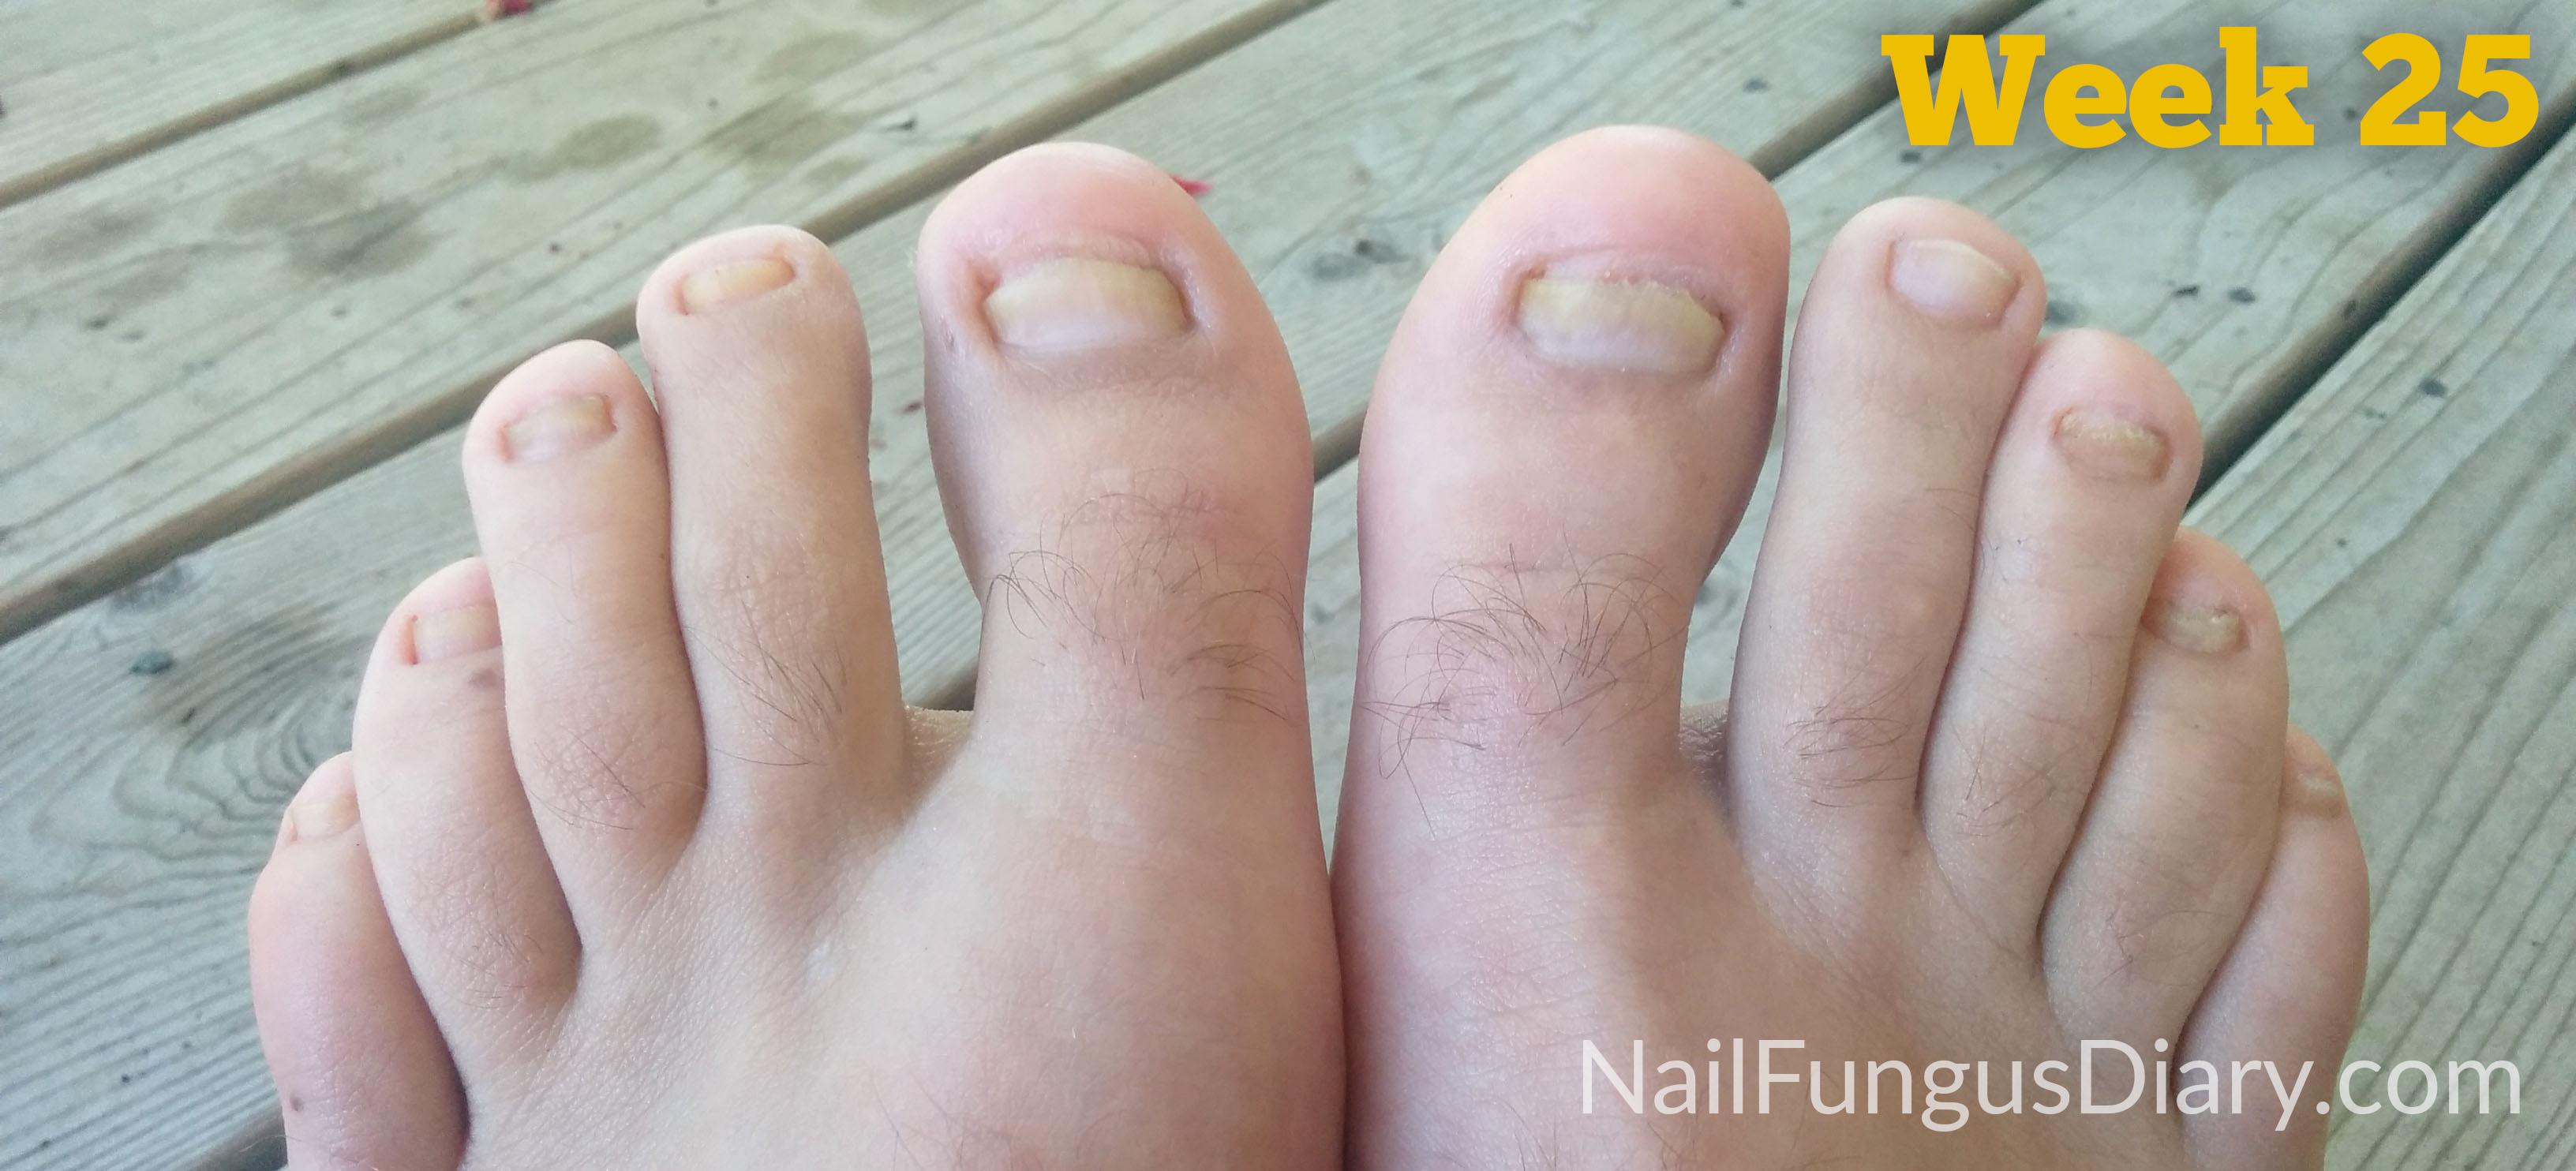 Nail Fungus Update, June 2015 - Nail Fungus Diary